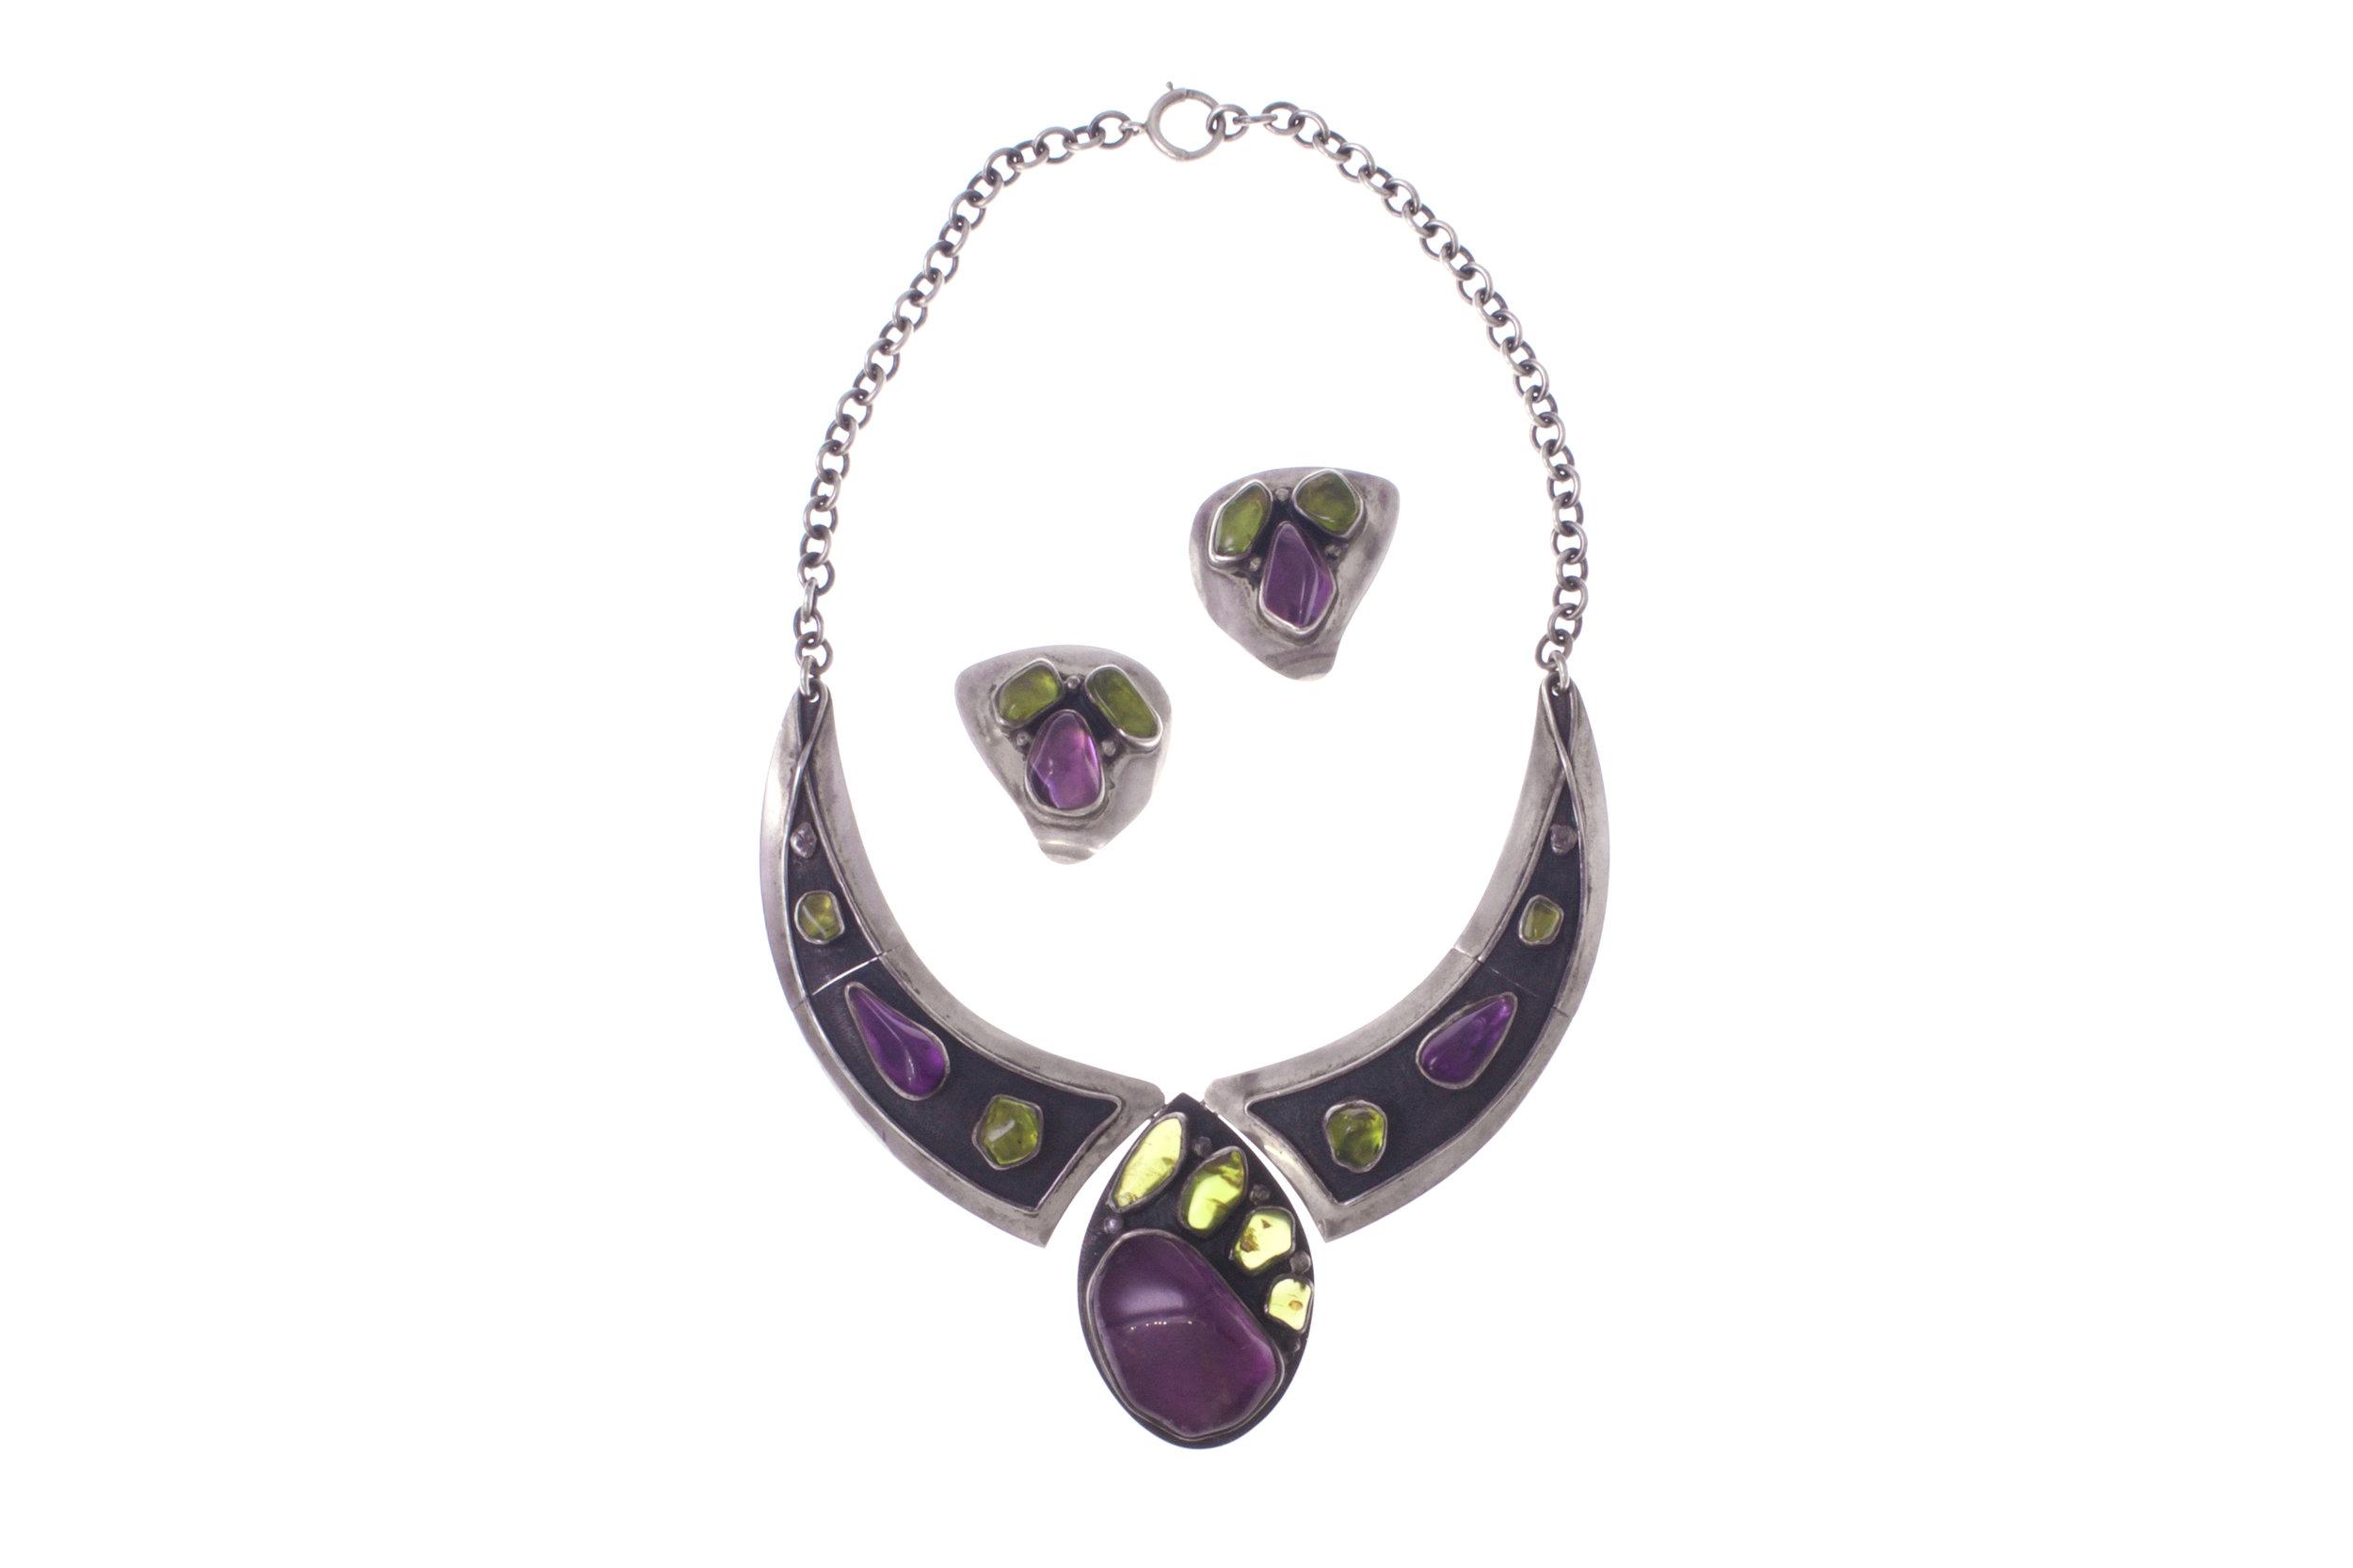 Amethyst, Peridot, Silver Necklace & Earrings, H. Fred Skaggs, c. 1960s